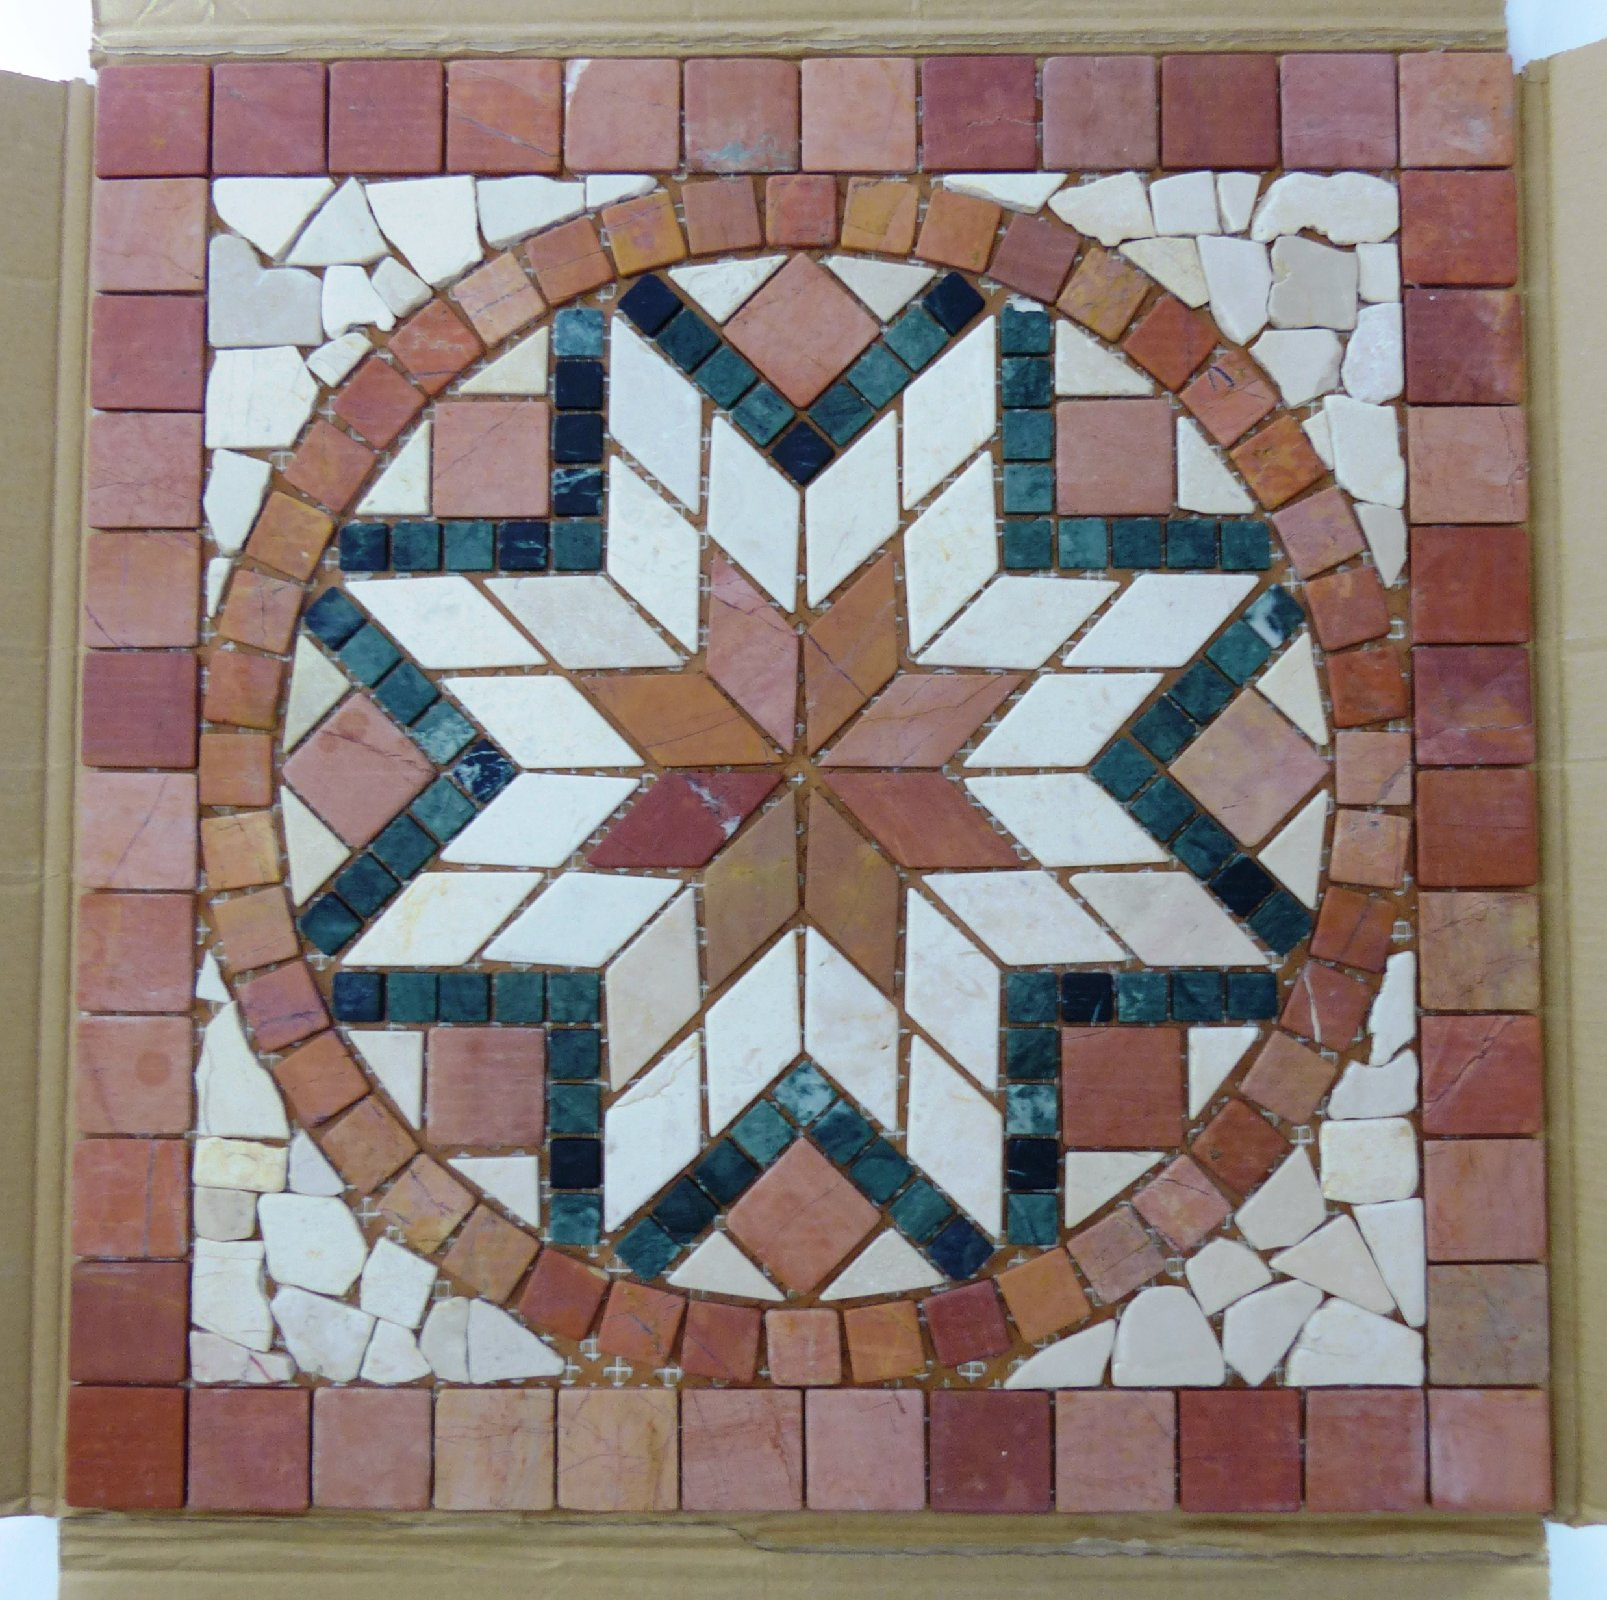 rosone mosaik fliese rom typ y 94 s marmor stern 60x60cm. Black Bedroom Furniture Sets. Home Design Ideas